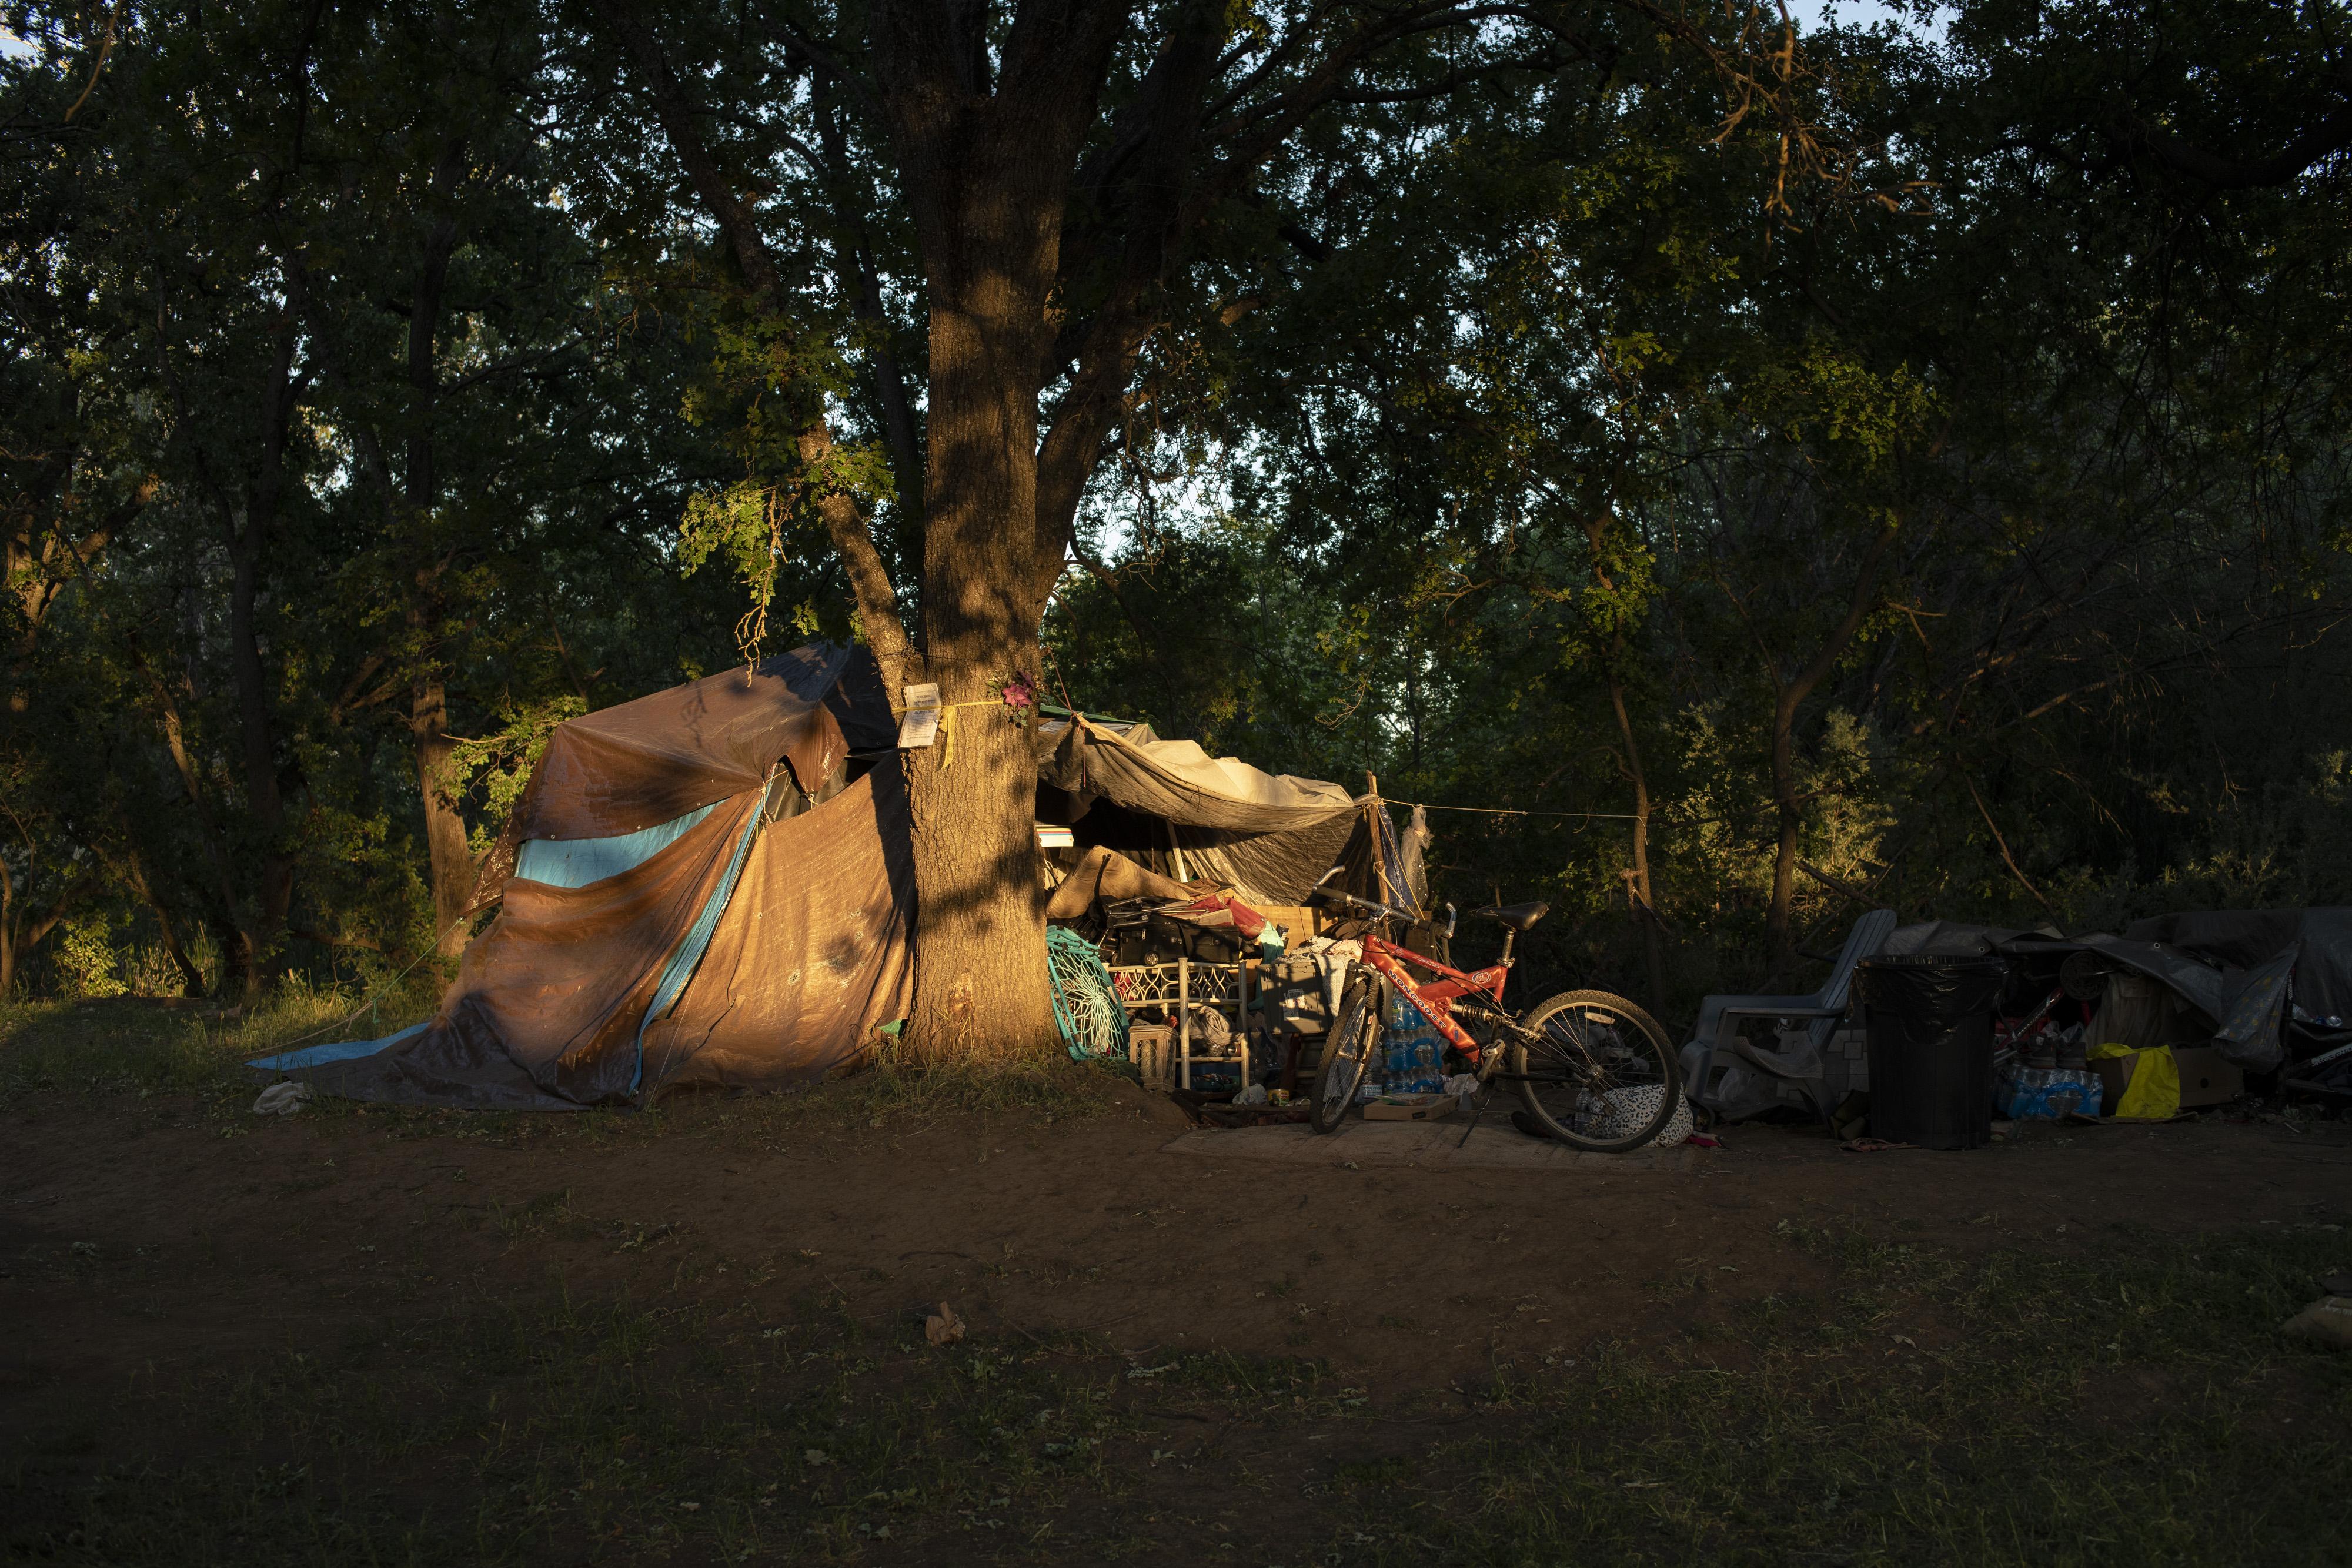 Tona Petersen's tent at Comanche Creek Greenway on May 4, 2021 in Chico, Calif. Salgu Wissmath for The Intercept